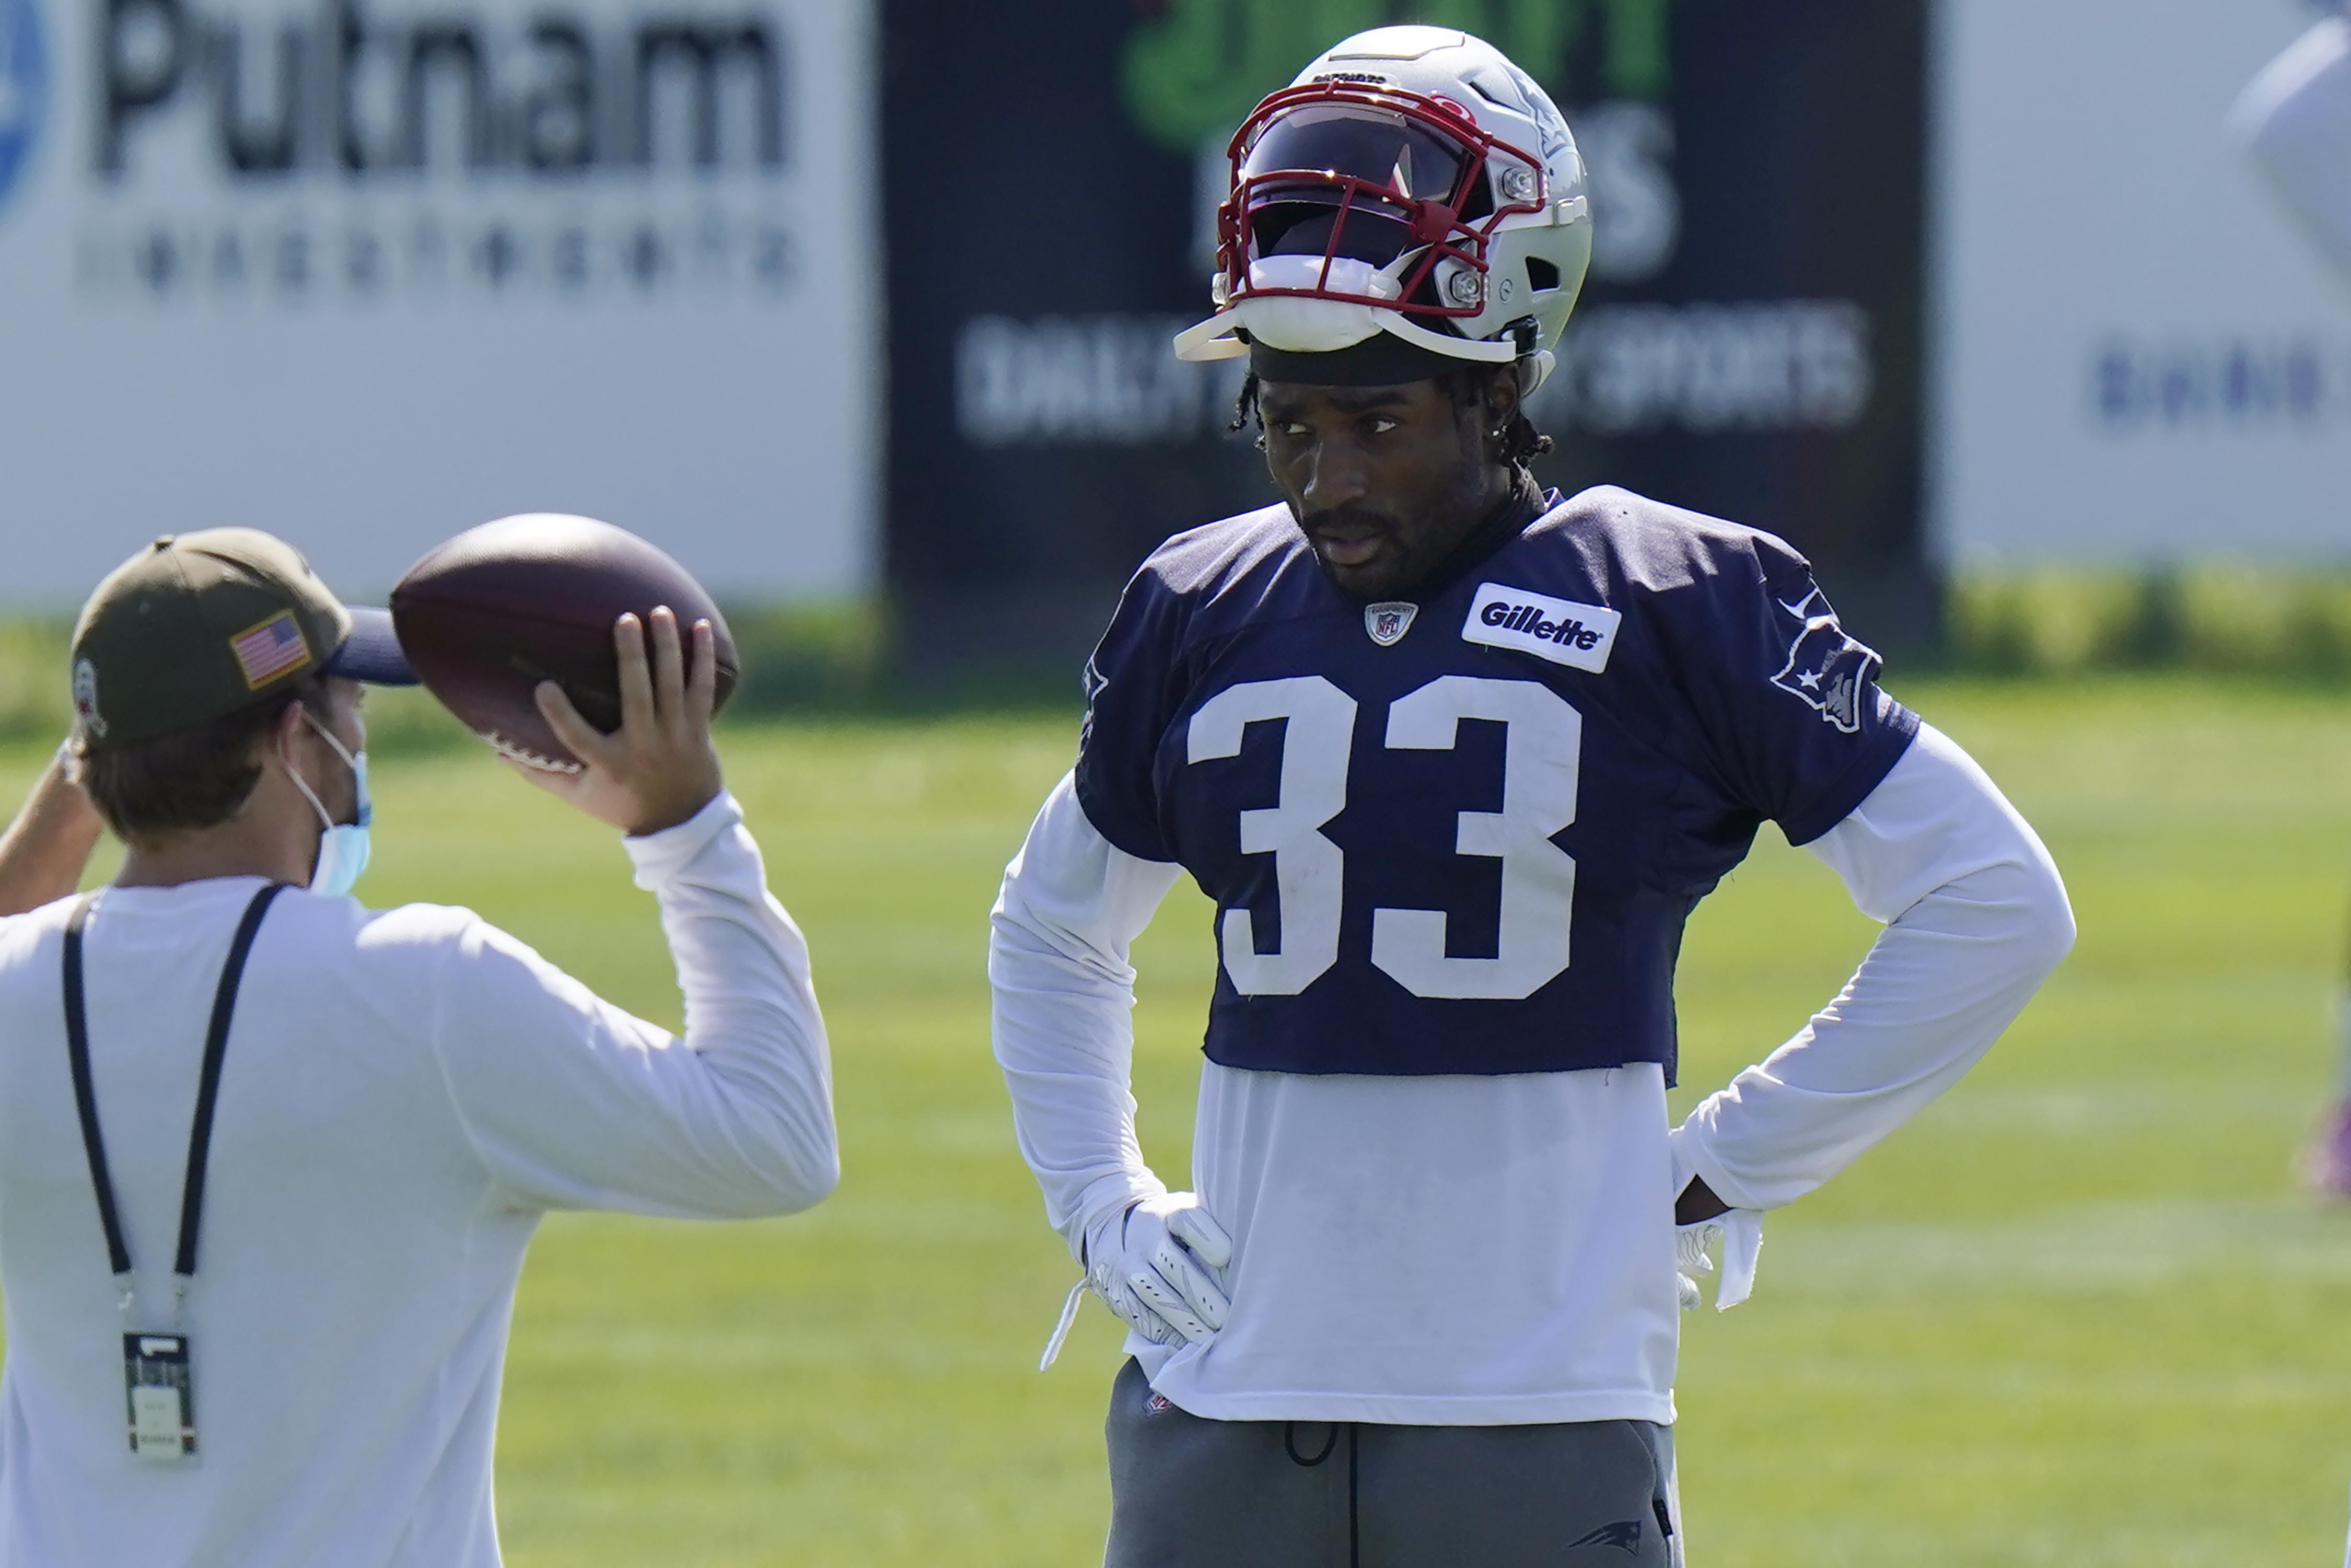 Sunday's Patriots training camp report: Joejuan Williams among the shining  stars - The Boston Globe